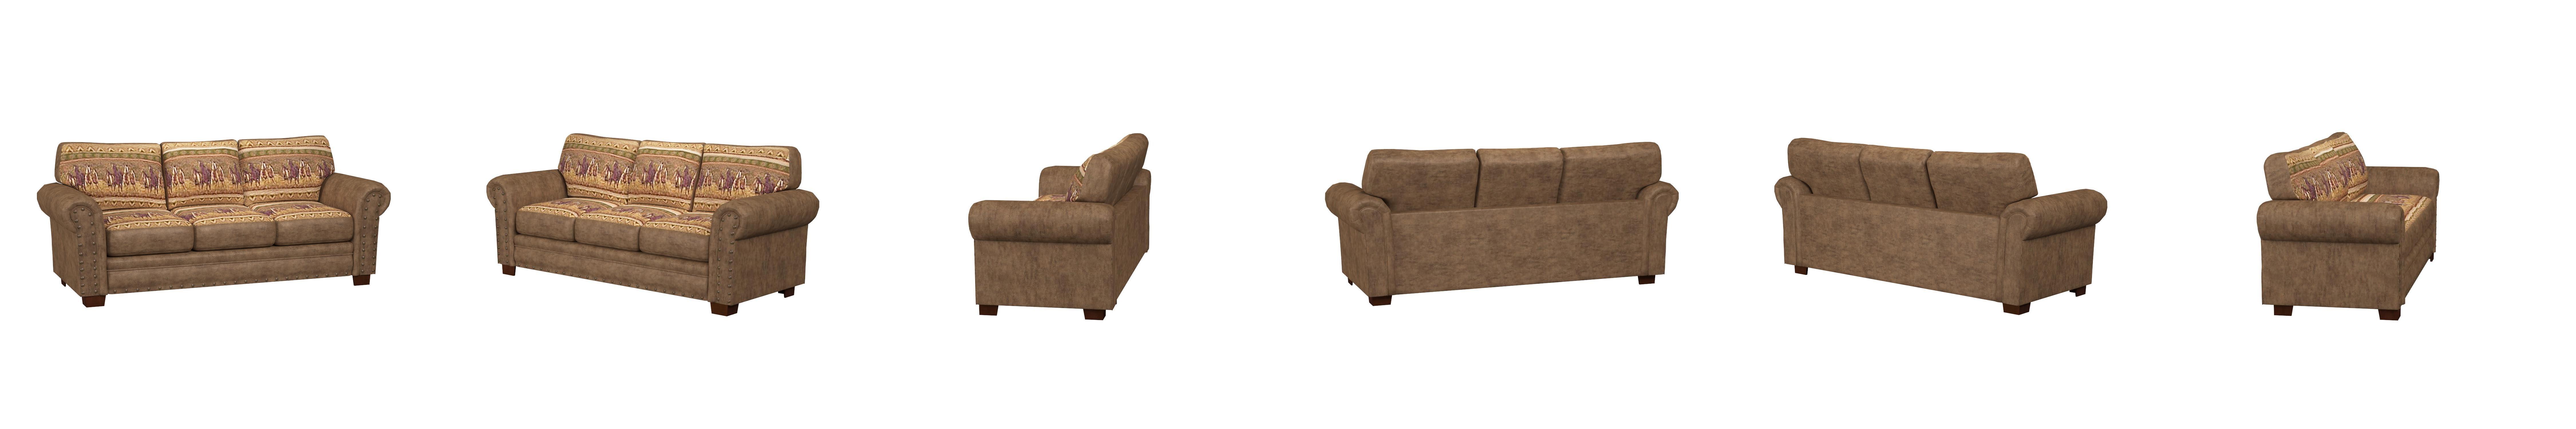 Amazon.com: American Furniture Classics Wild Horses Sofa: Kitchen ...